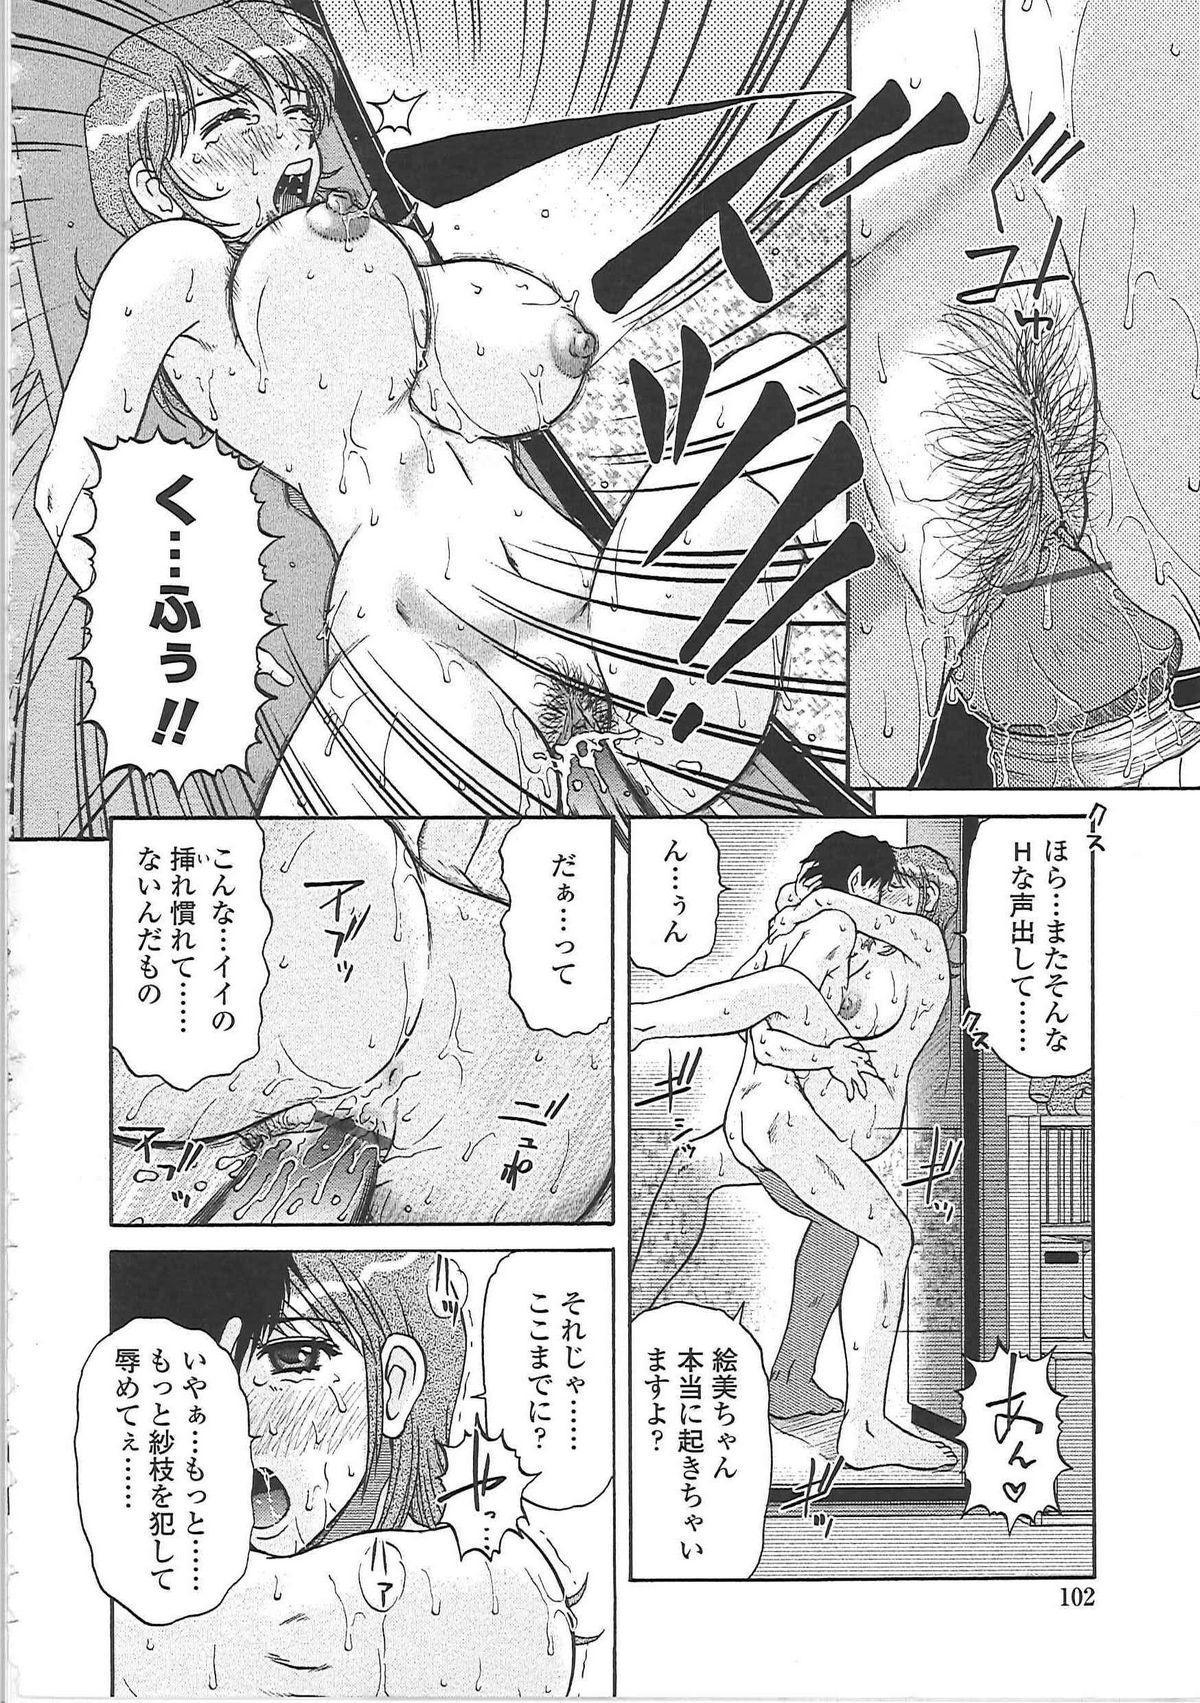 Nikuzuma Tsuushin - Erotic Wife Communication 106